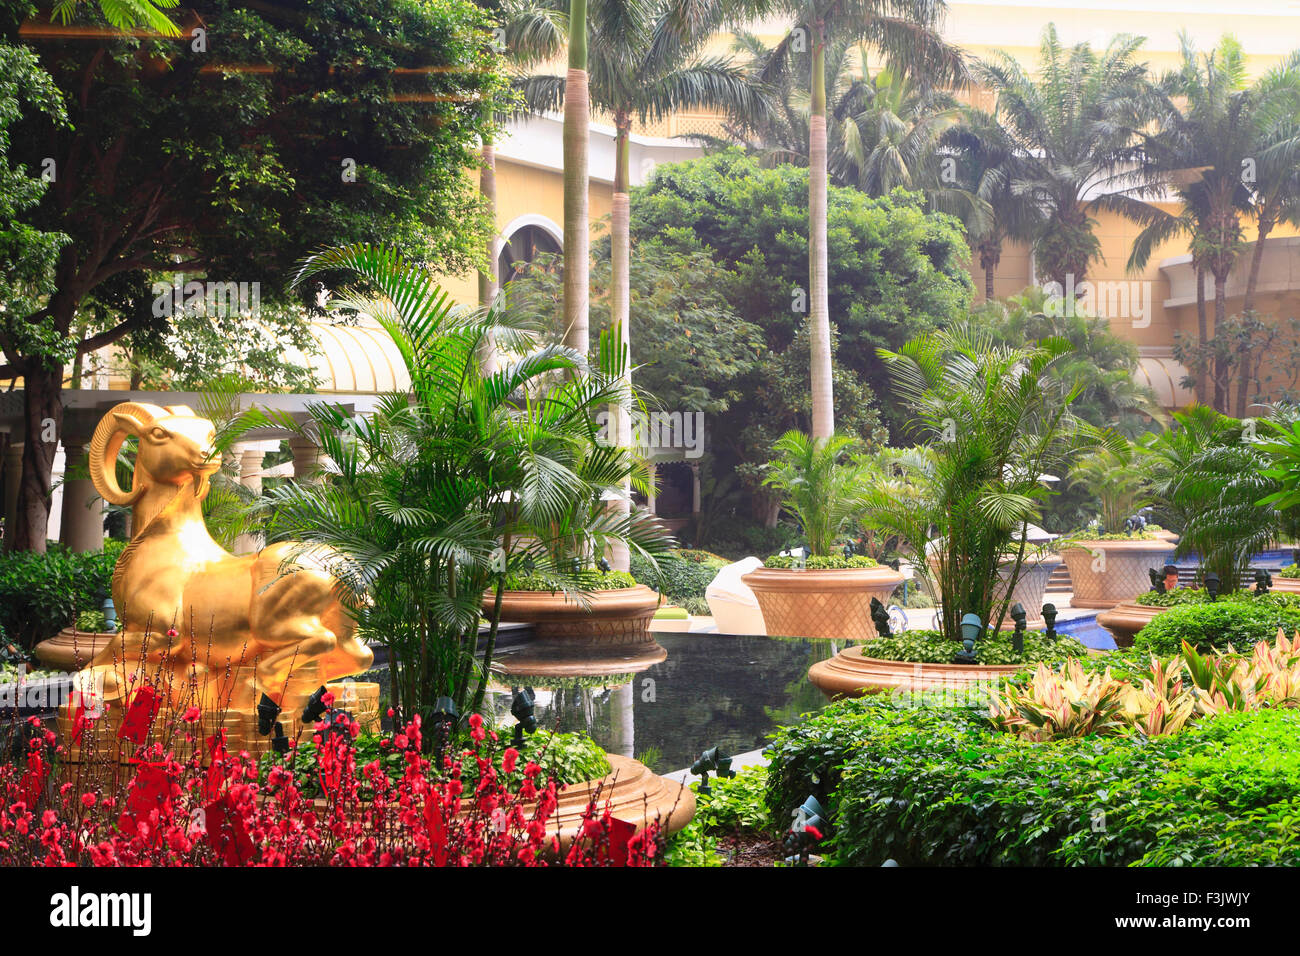 China, Macao, Hotel Wynn, jardín, Imagen De Stock